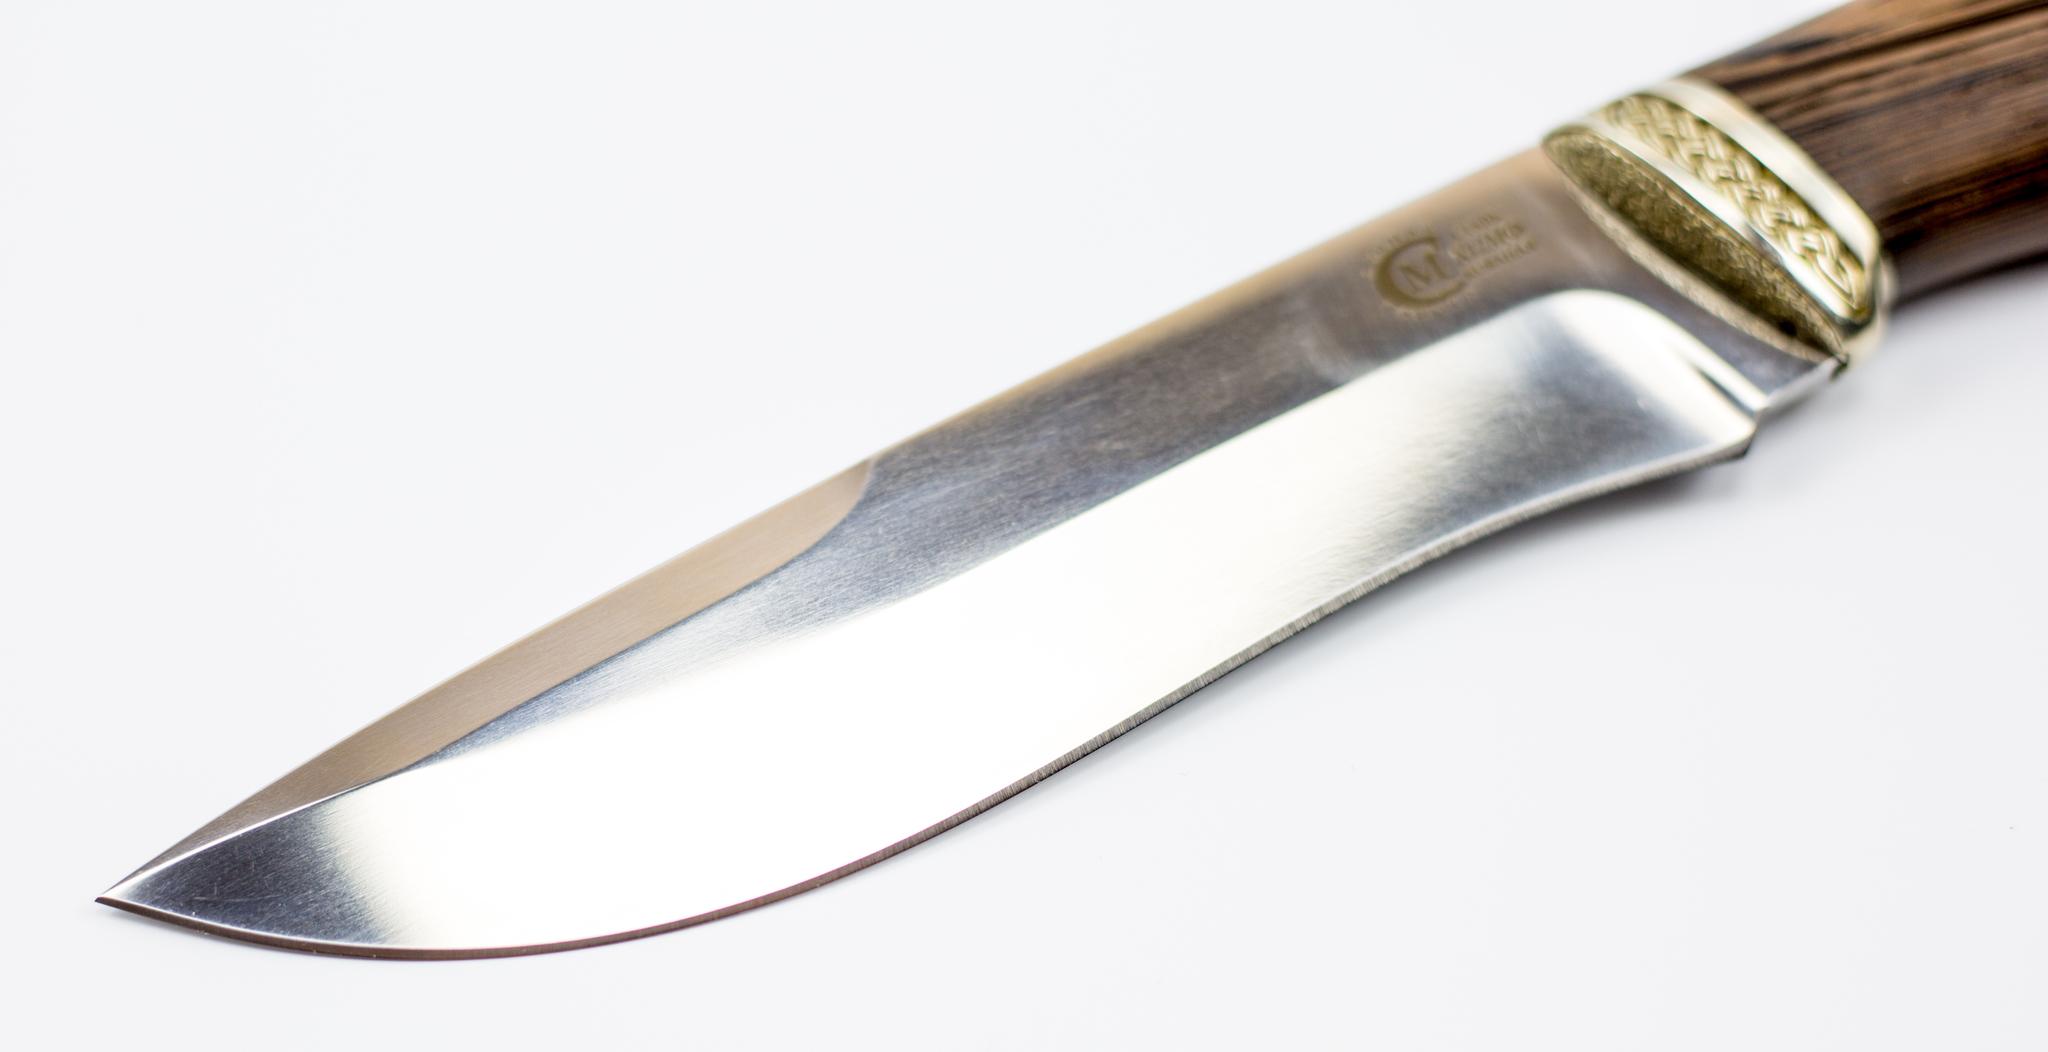 Фото 4 - Нож из Х12МФ